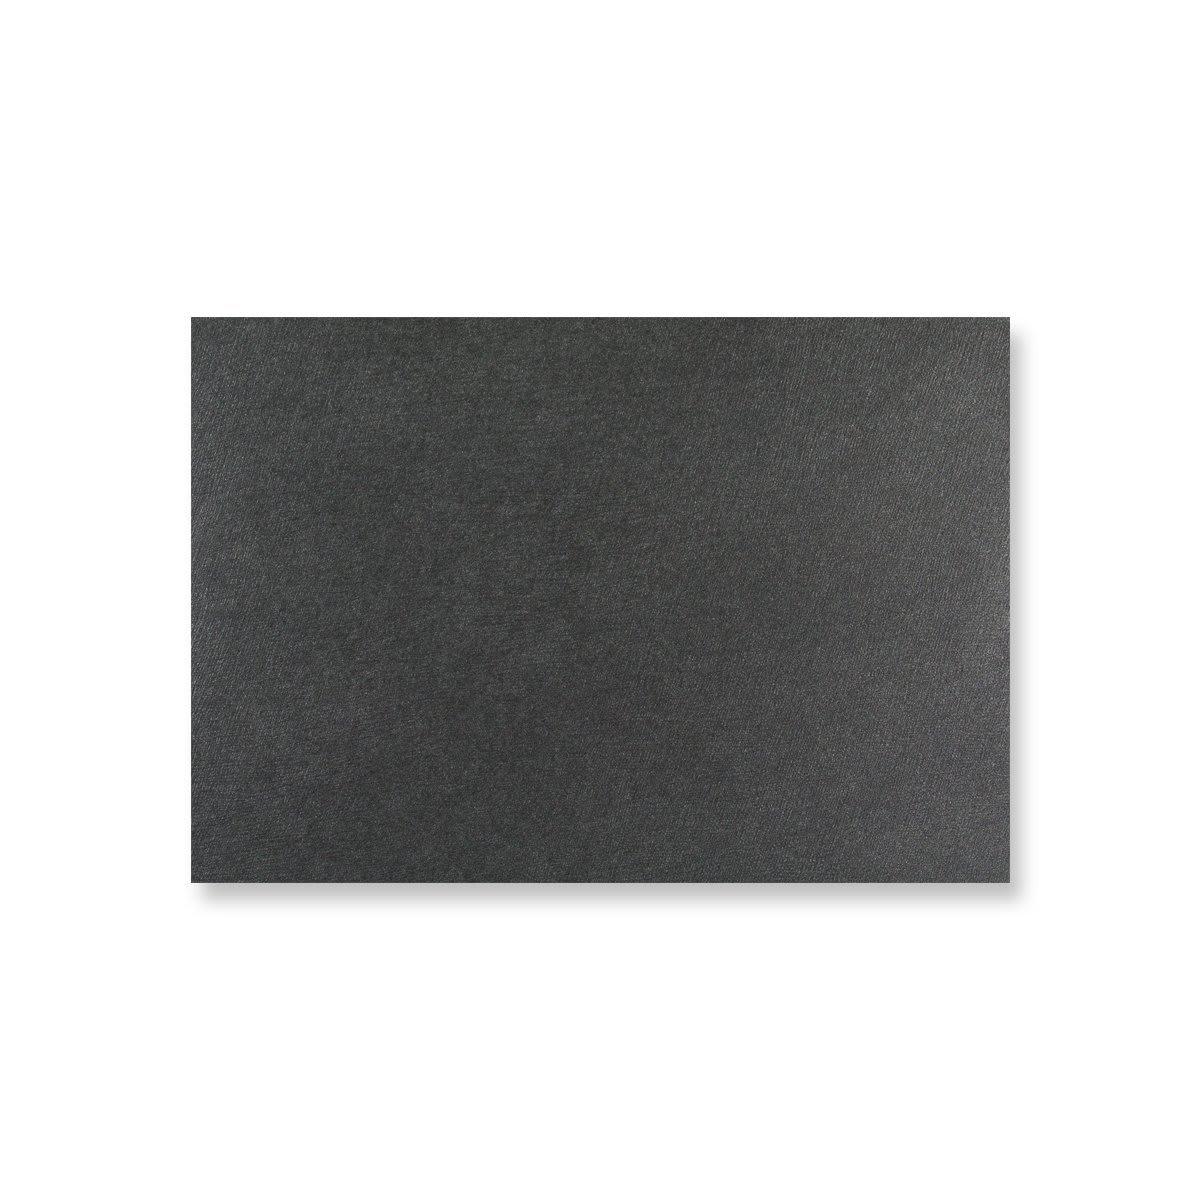 C6 SLATE GREY BUTTERFLY ENVELOPES